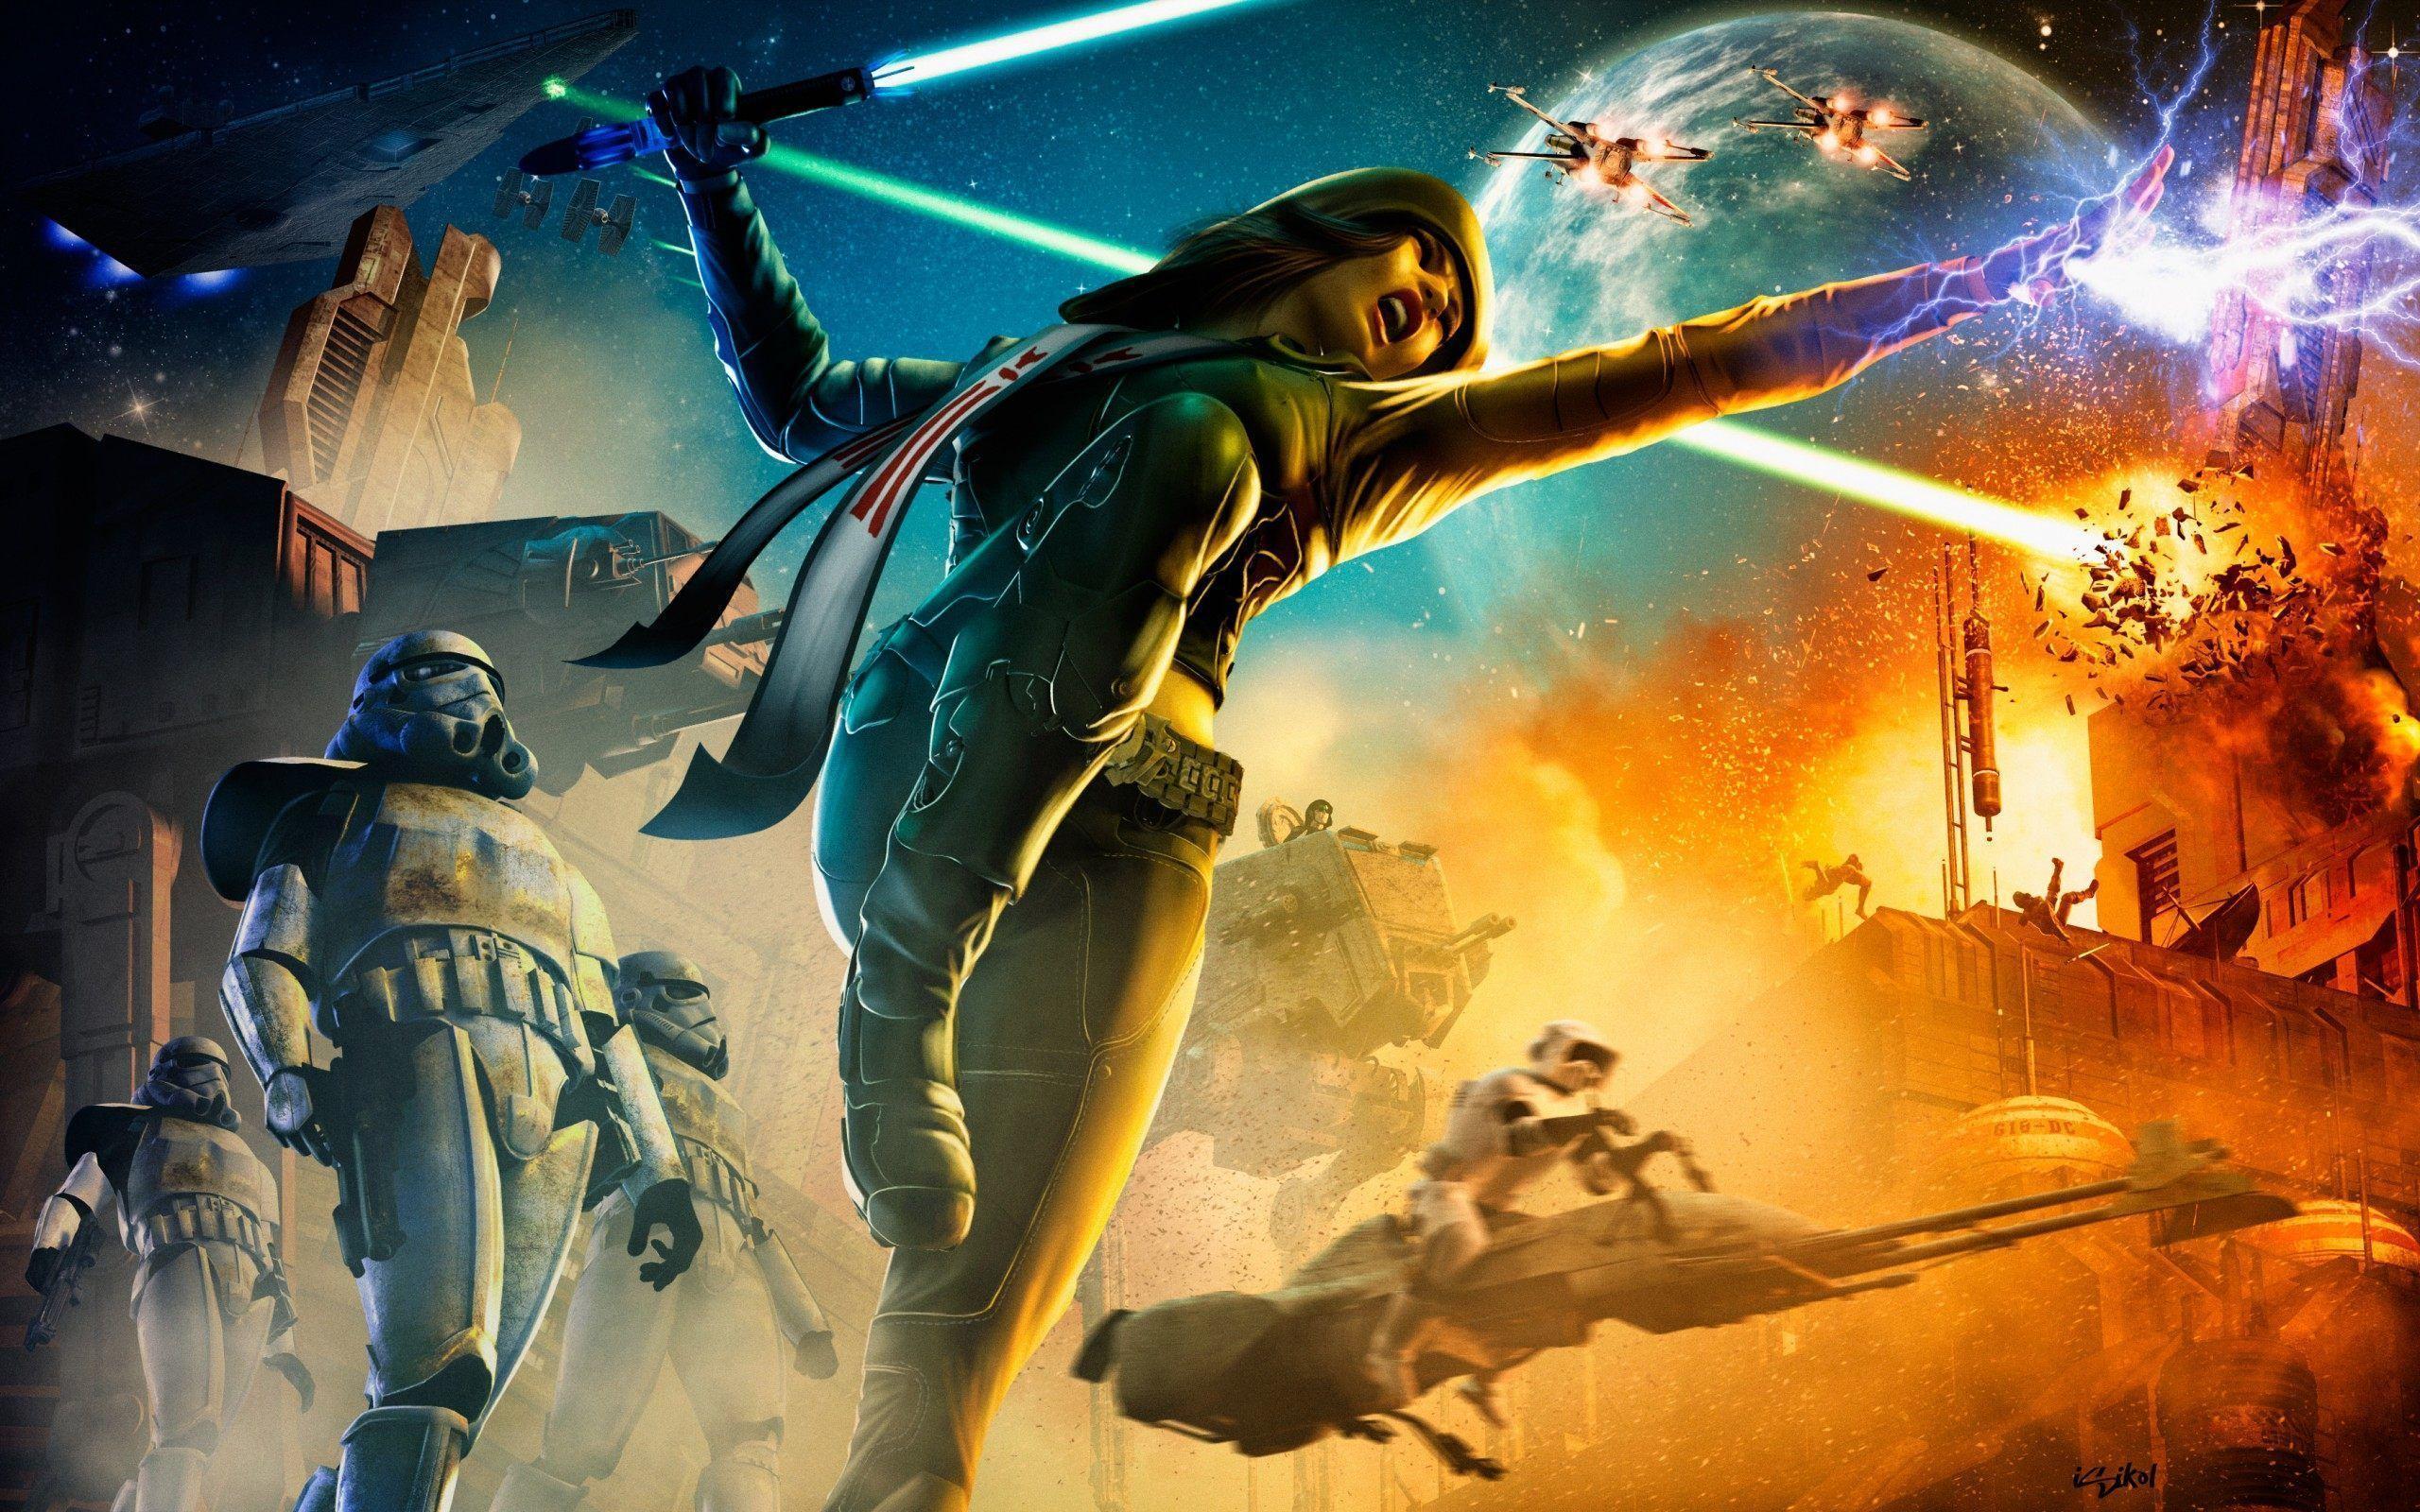 Star Wars Rebels Wallpapers - Wallpaper Cave